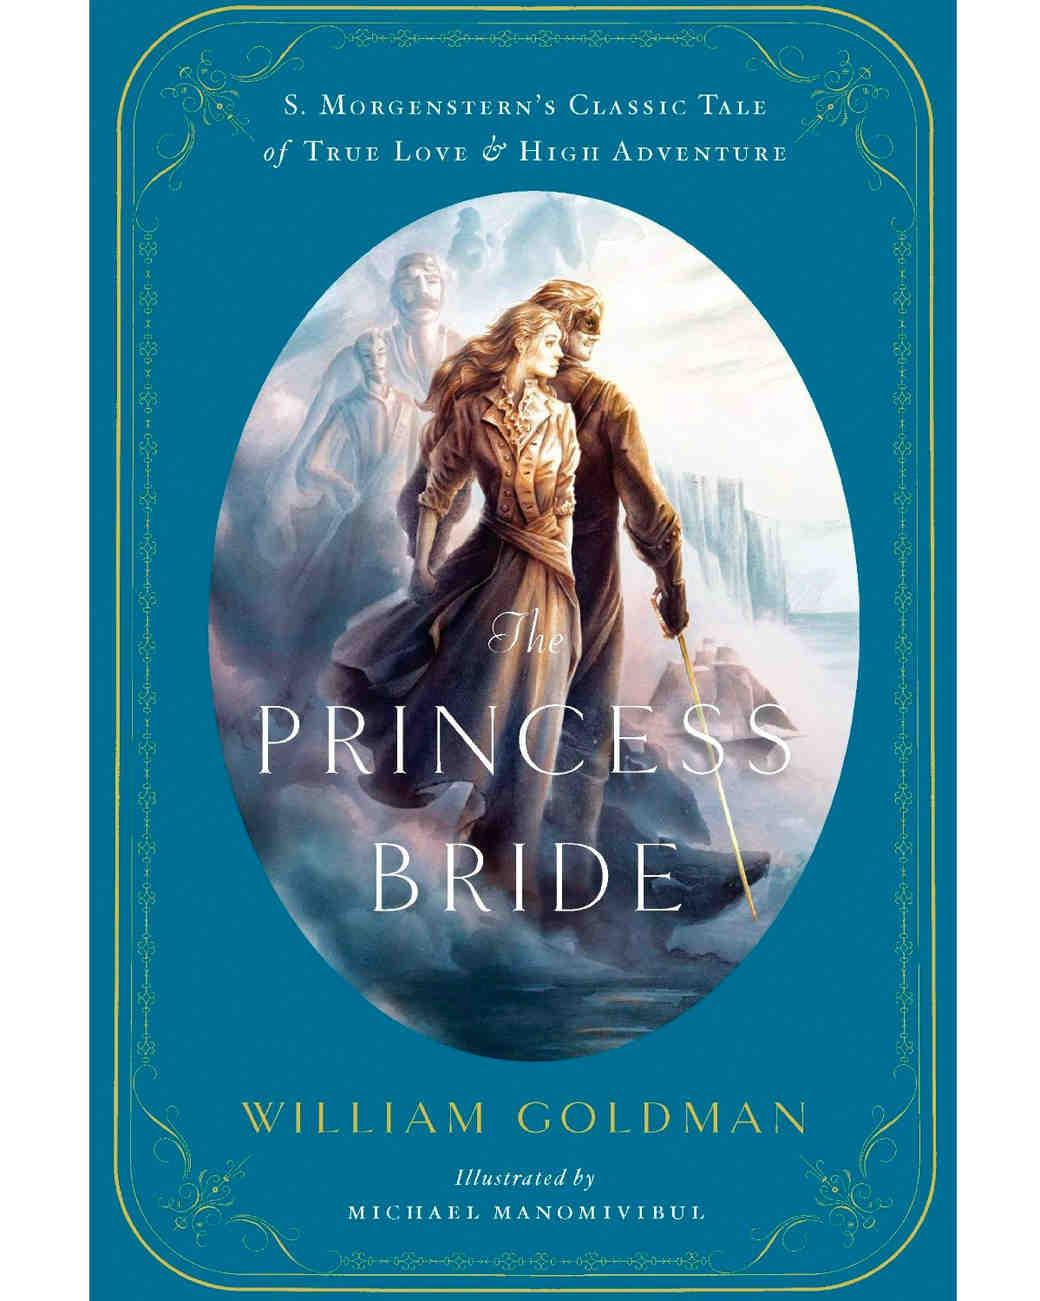 books-read-before-marriage-princess-bride-goldman-0115.jpg